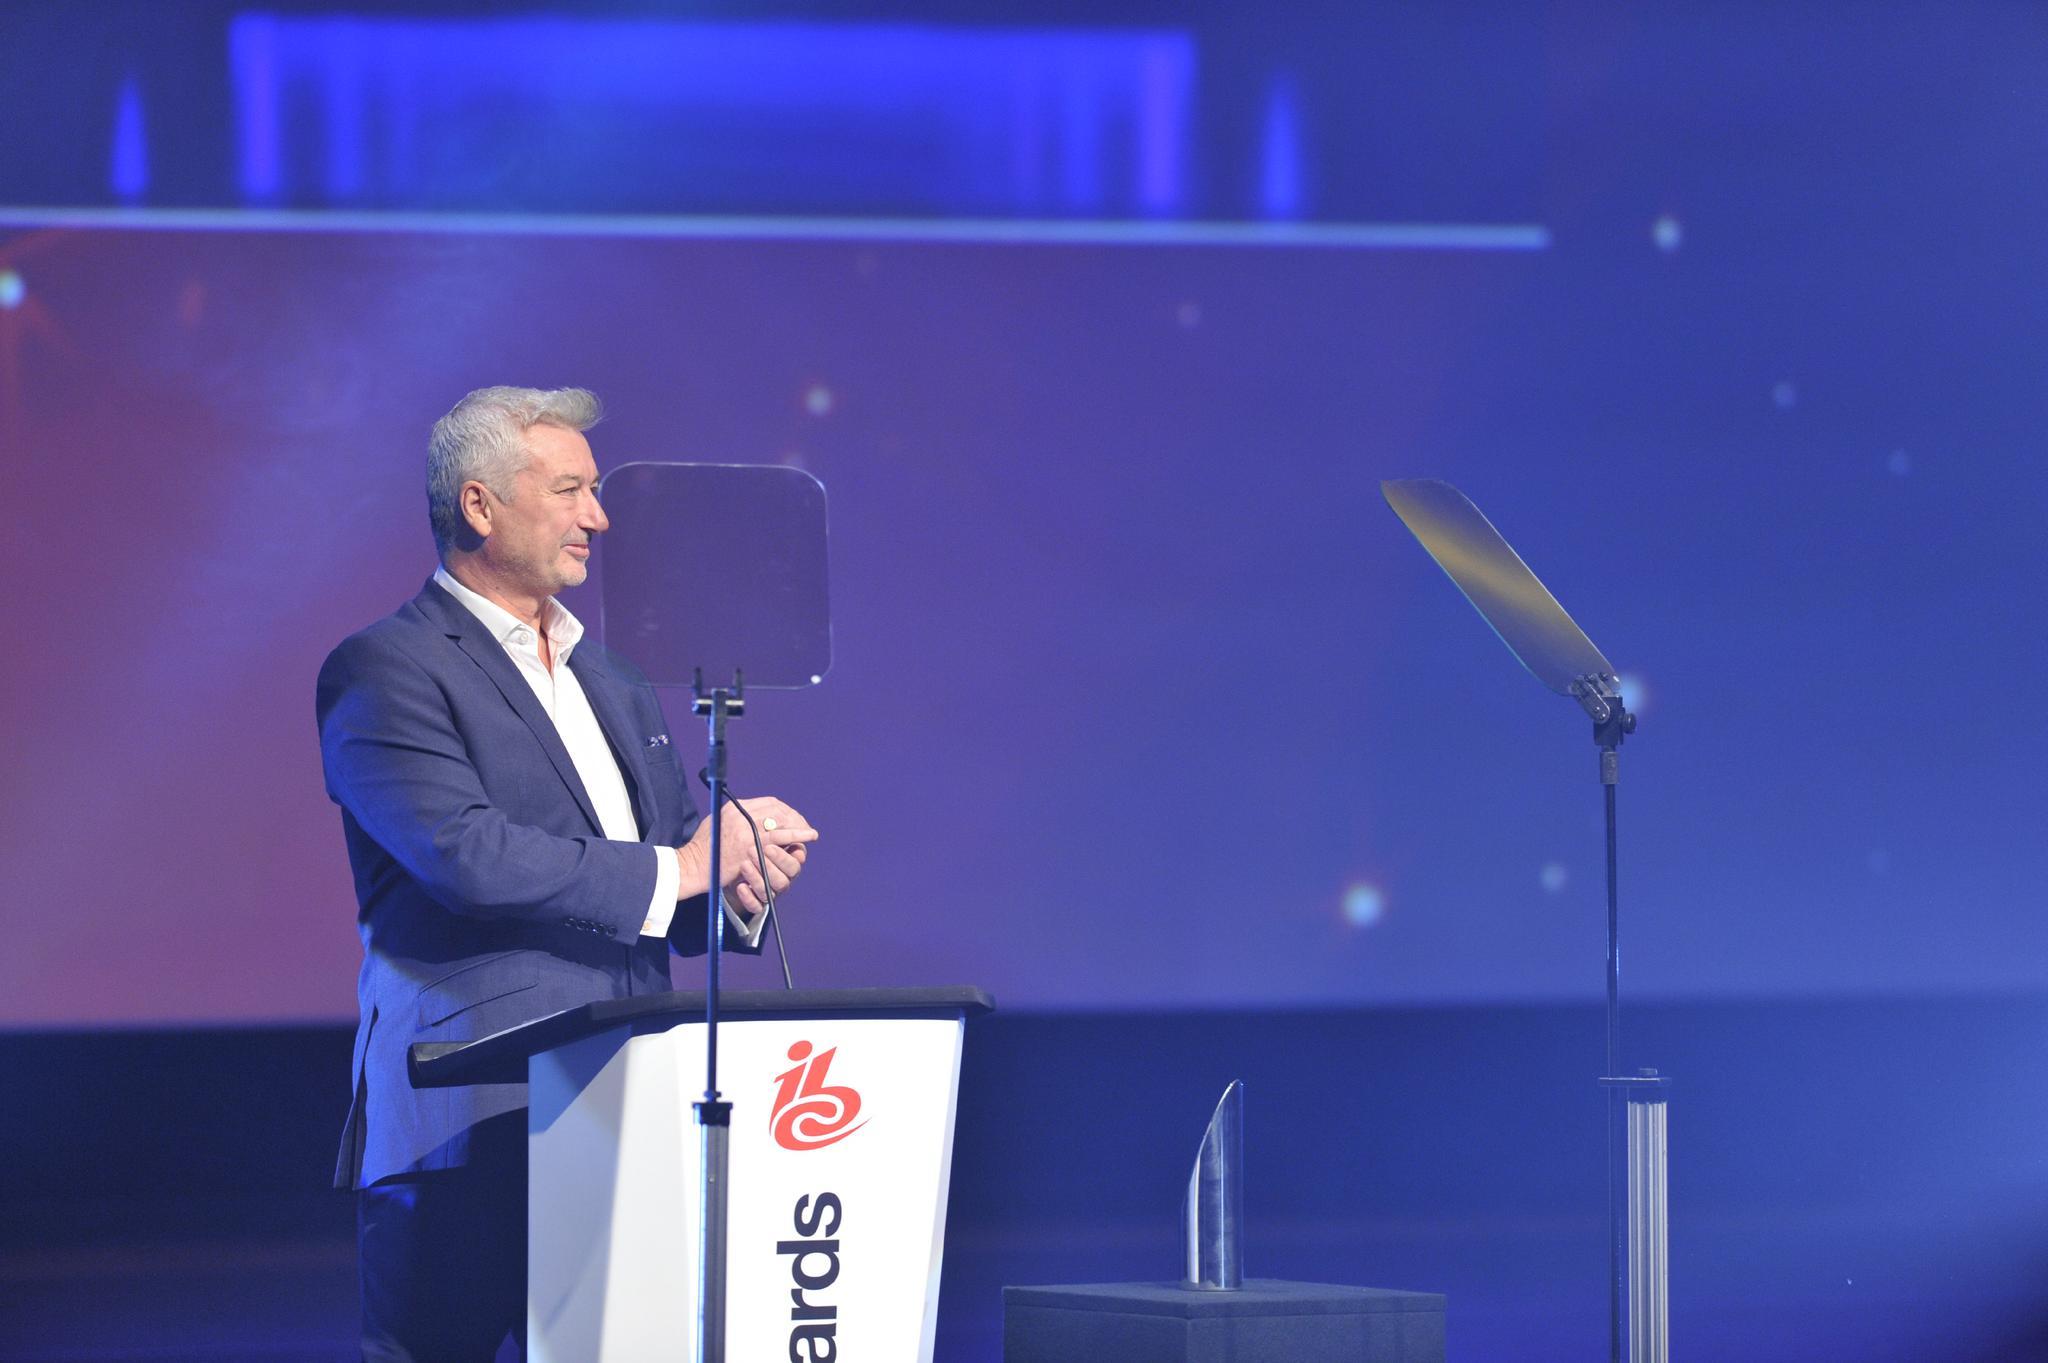 Innovation Awards Shortlist Announced